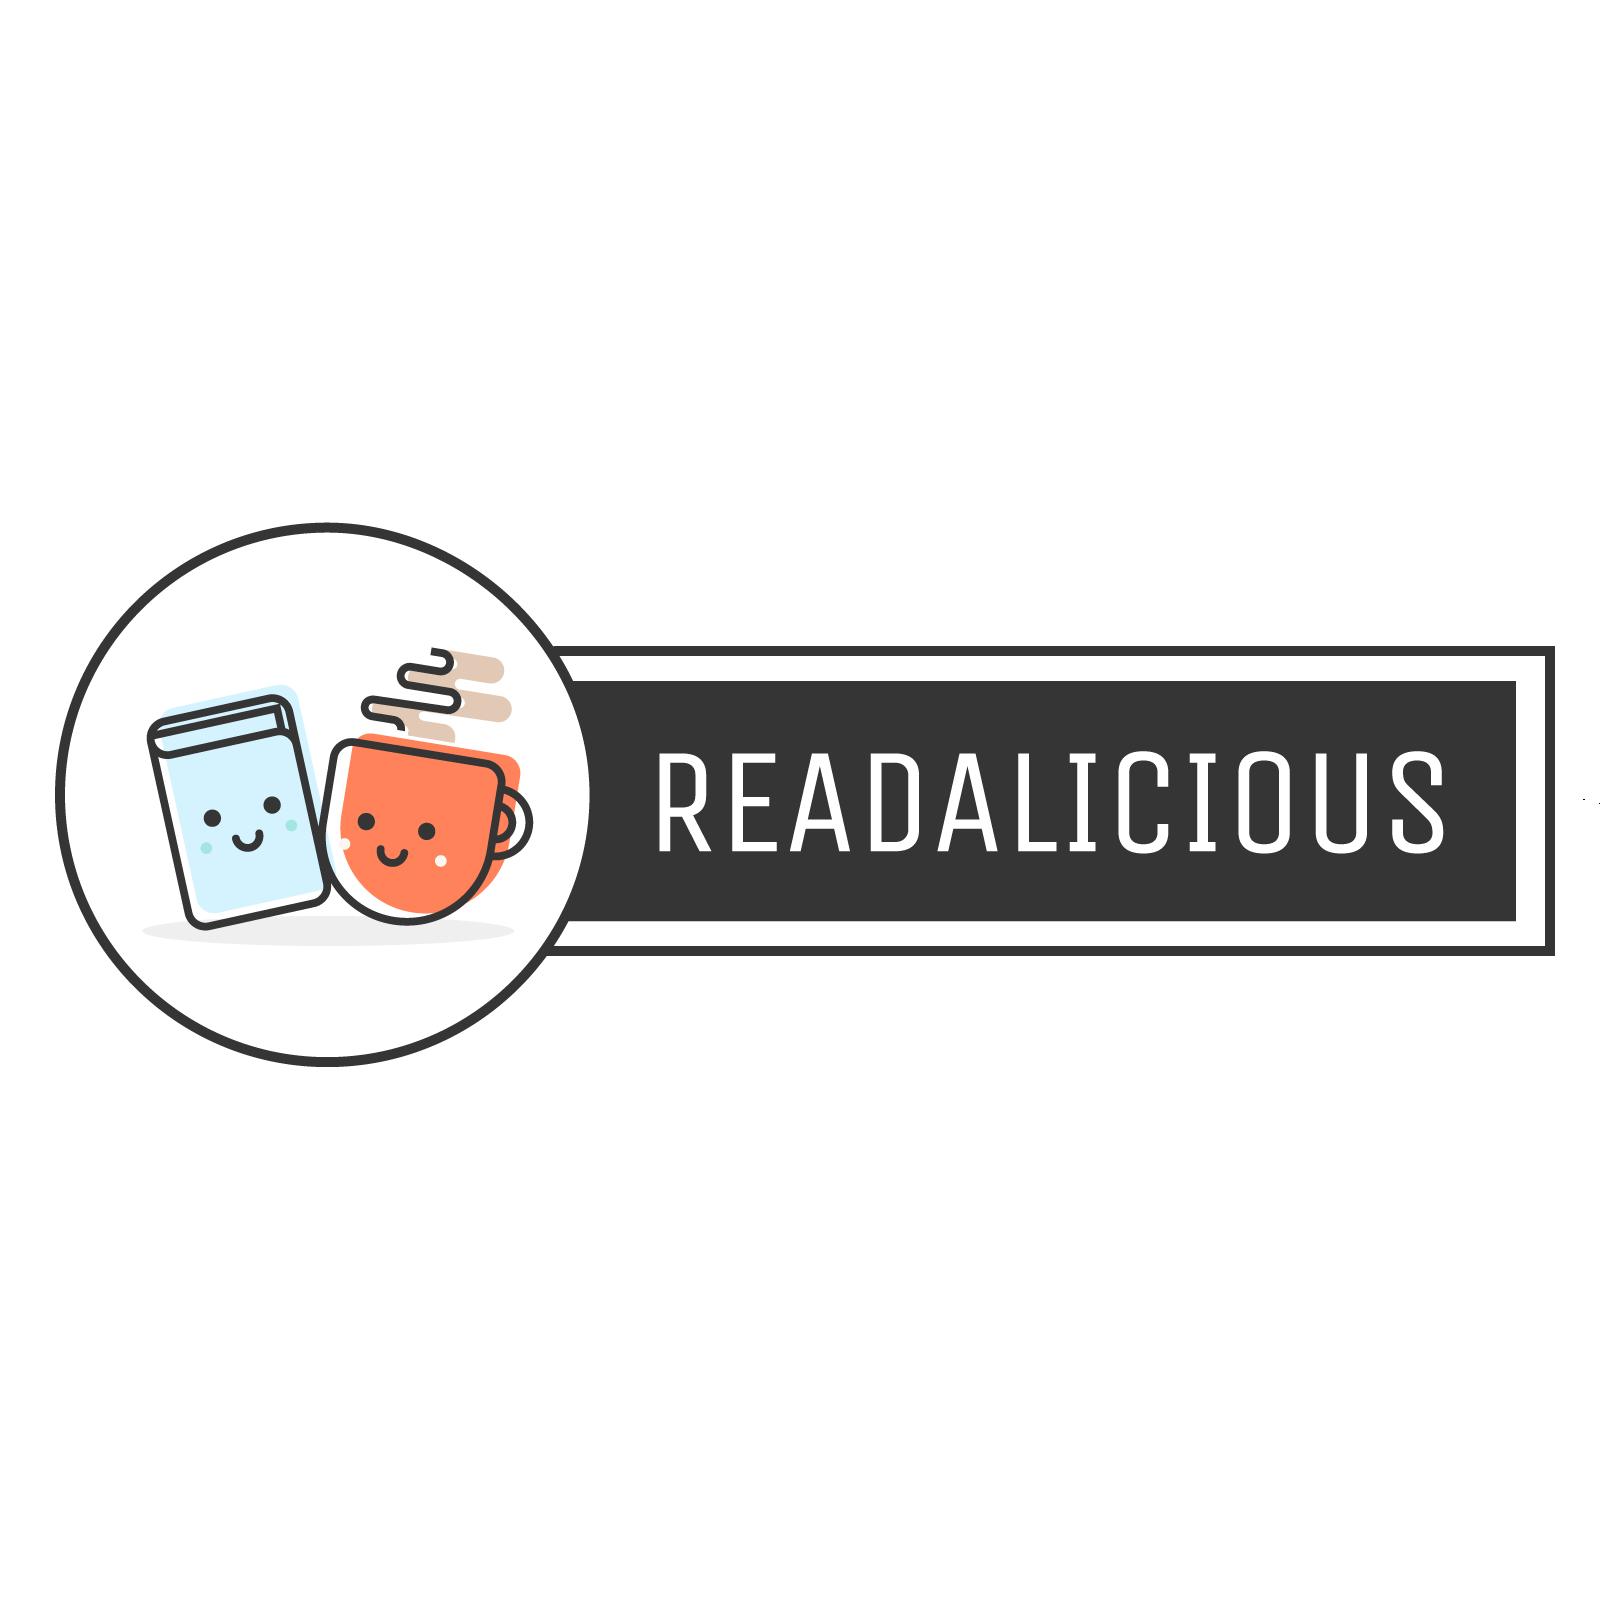 Readalicious